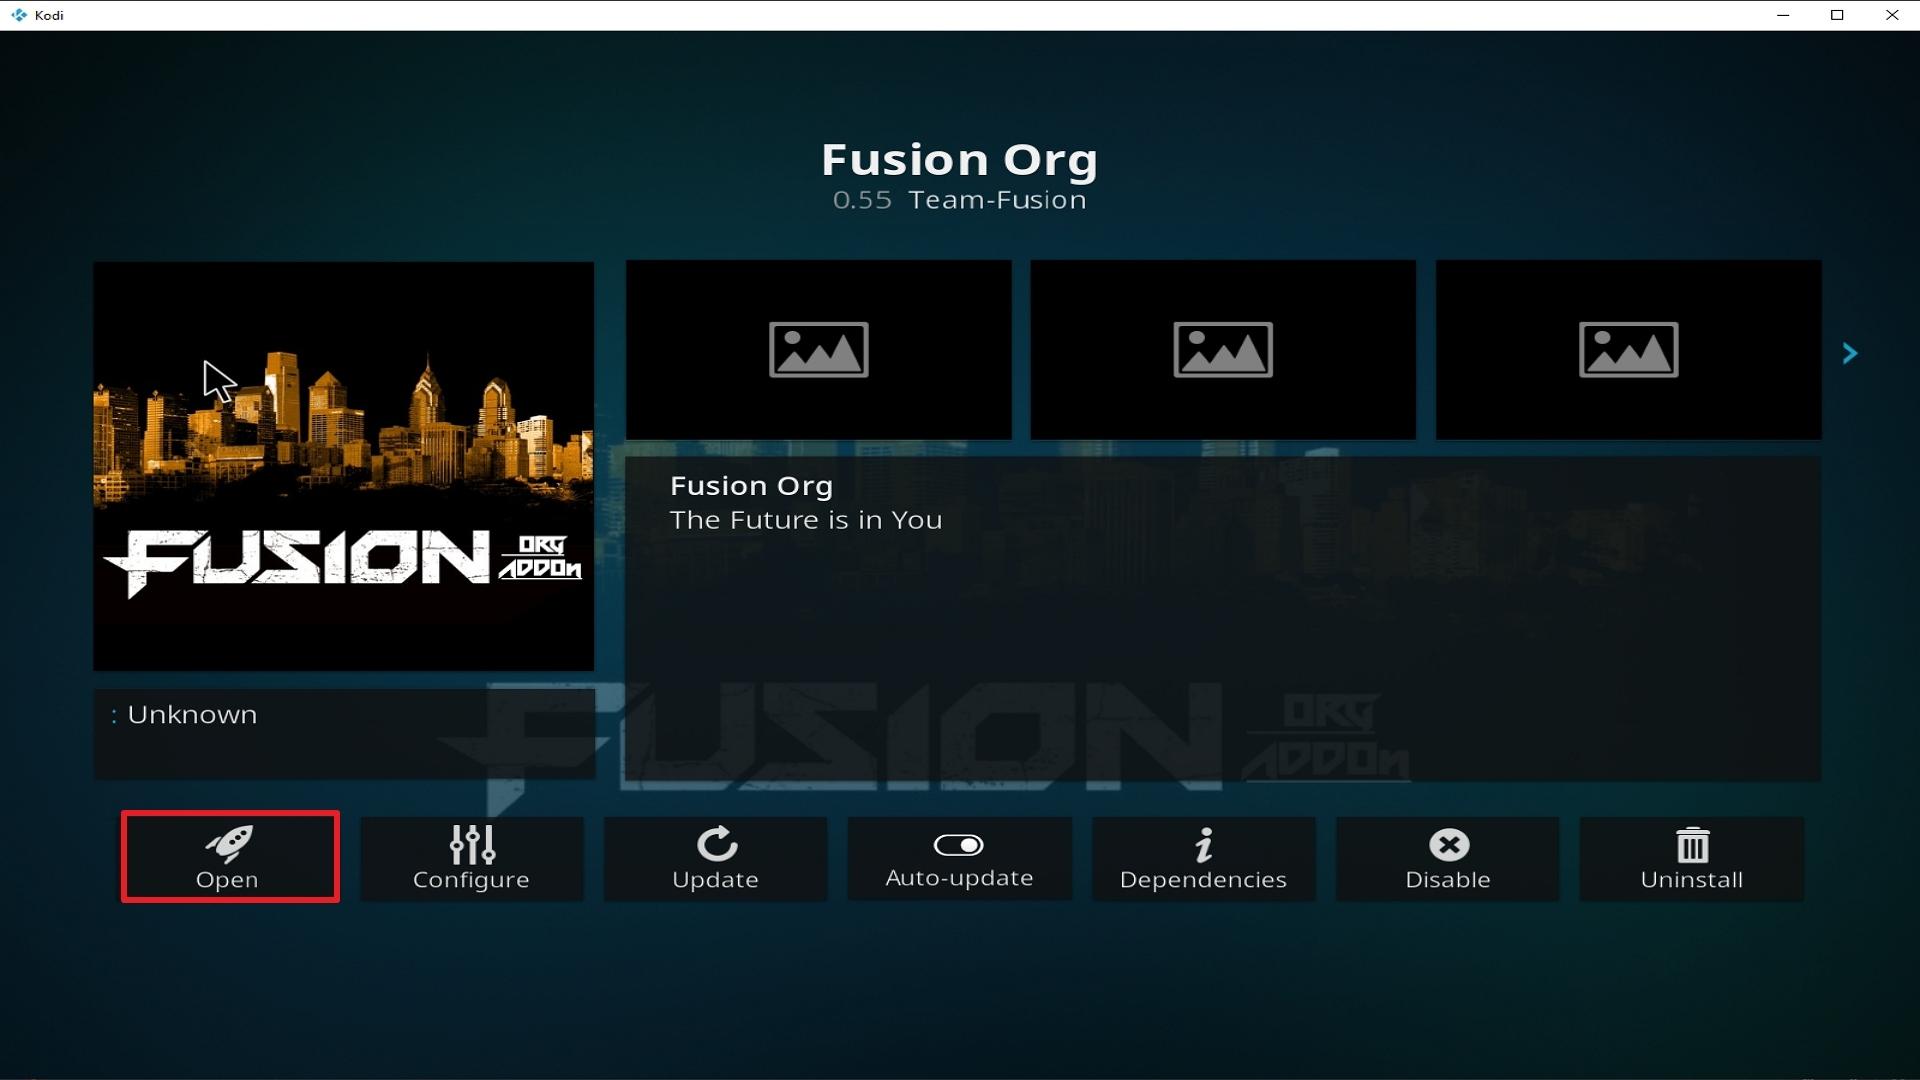 Step 26 Installing Fusion Org addon on Kodi